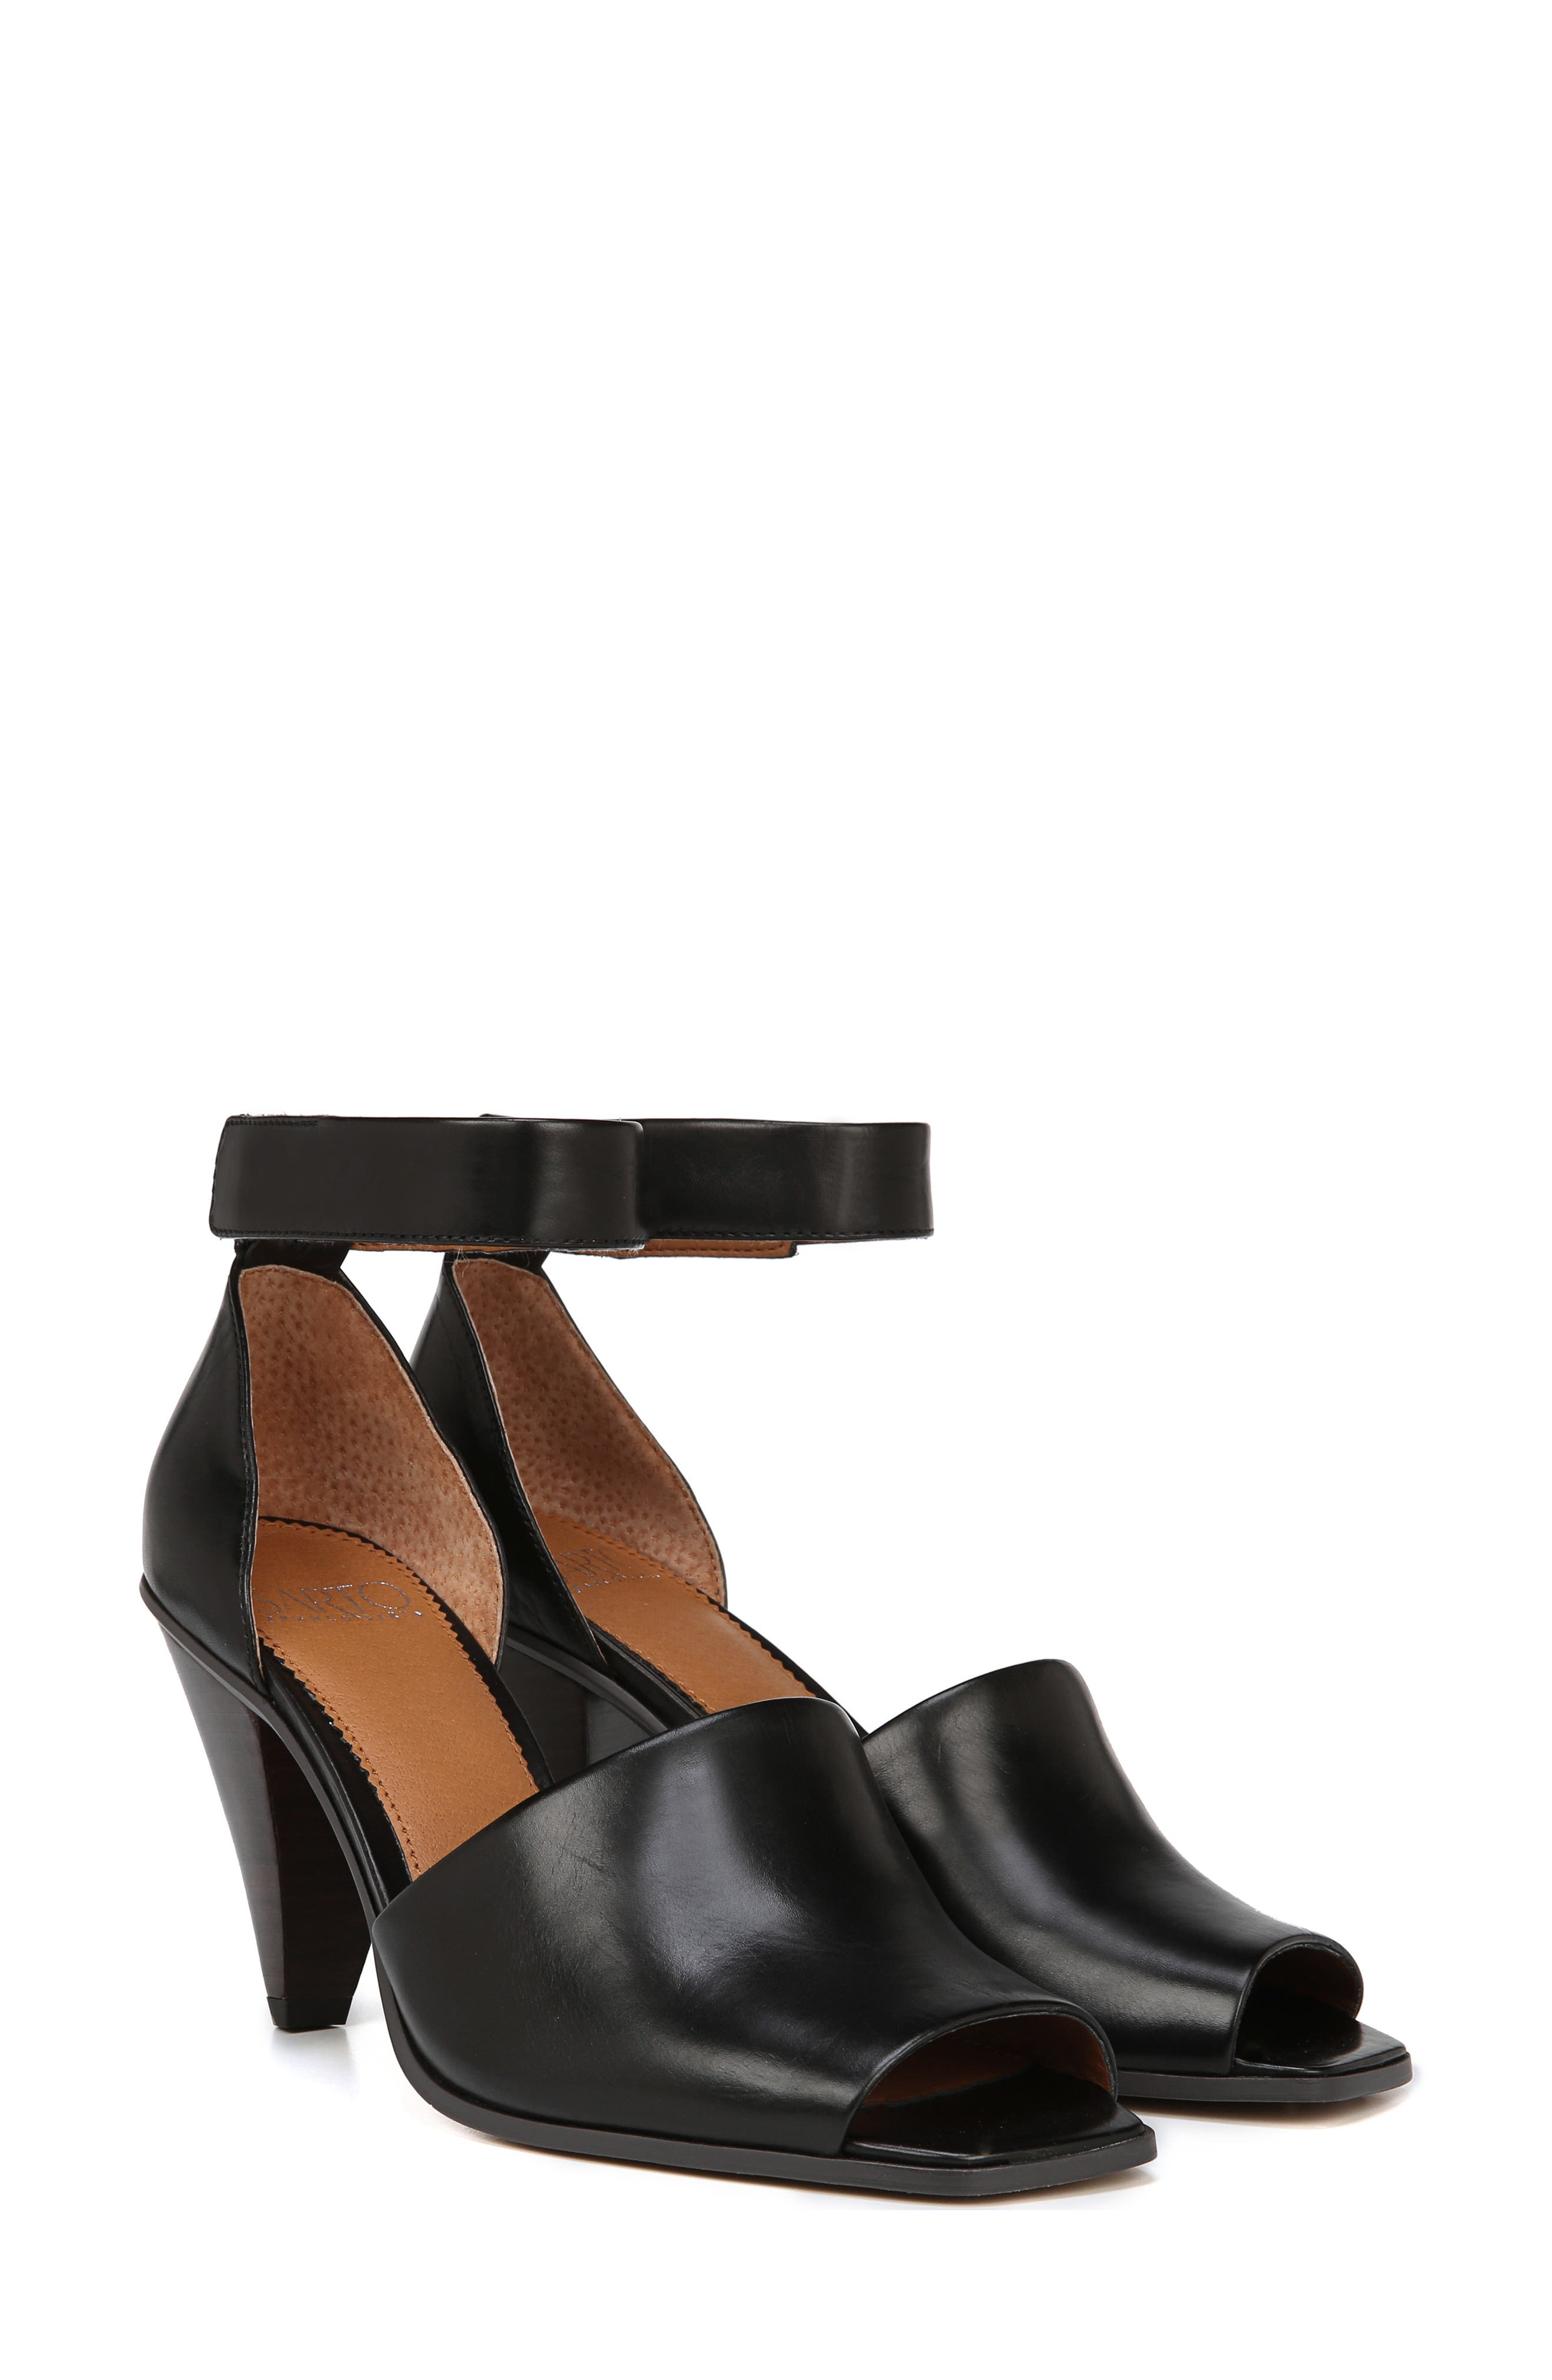 SARTO BY FRANCO SARTO, Ankle Strap Sandal, Alternate thumbnail 7, color, BLACK FOULARD LEATHER